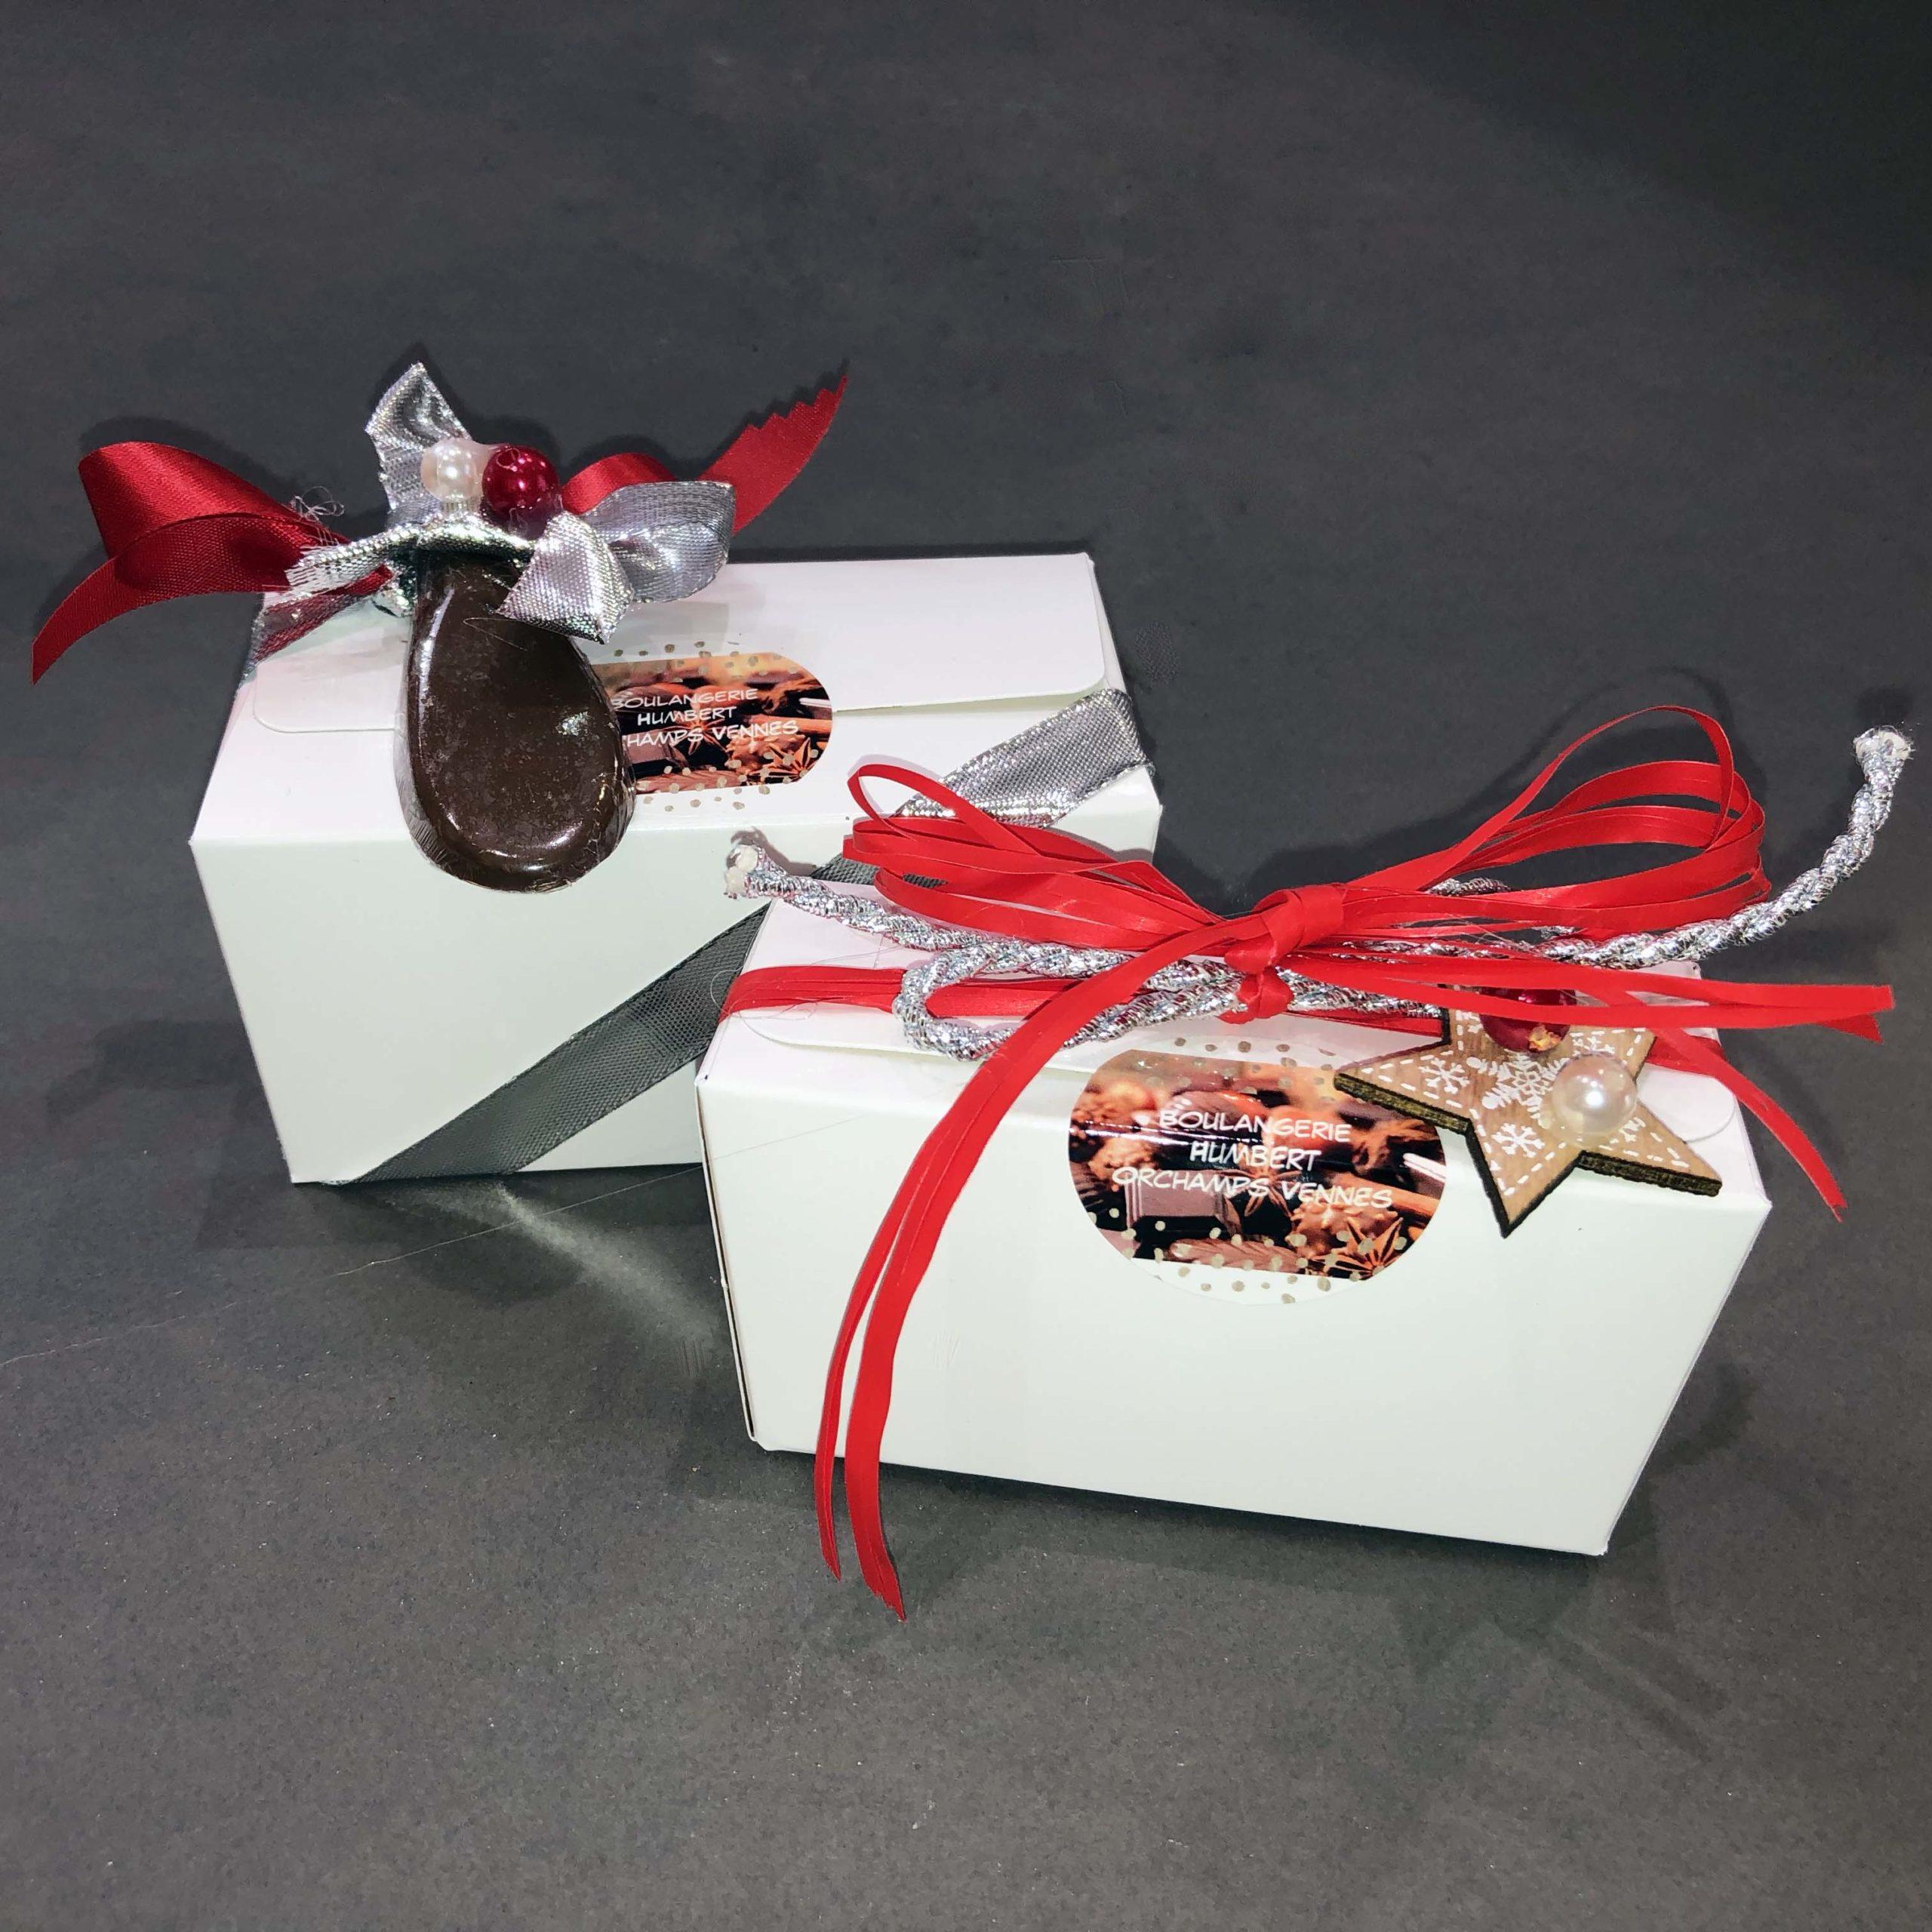 ballotins chocolats